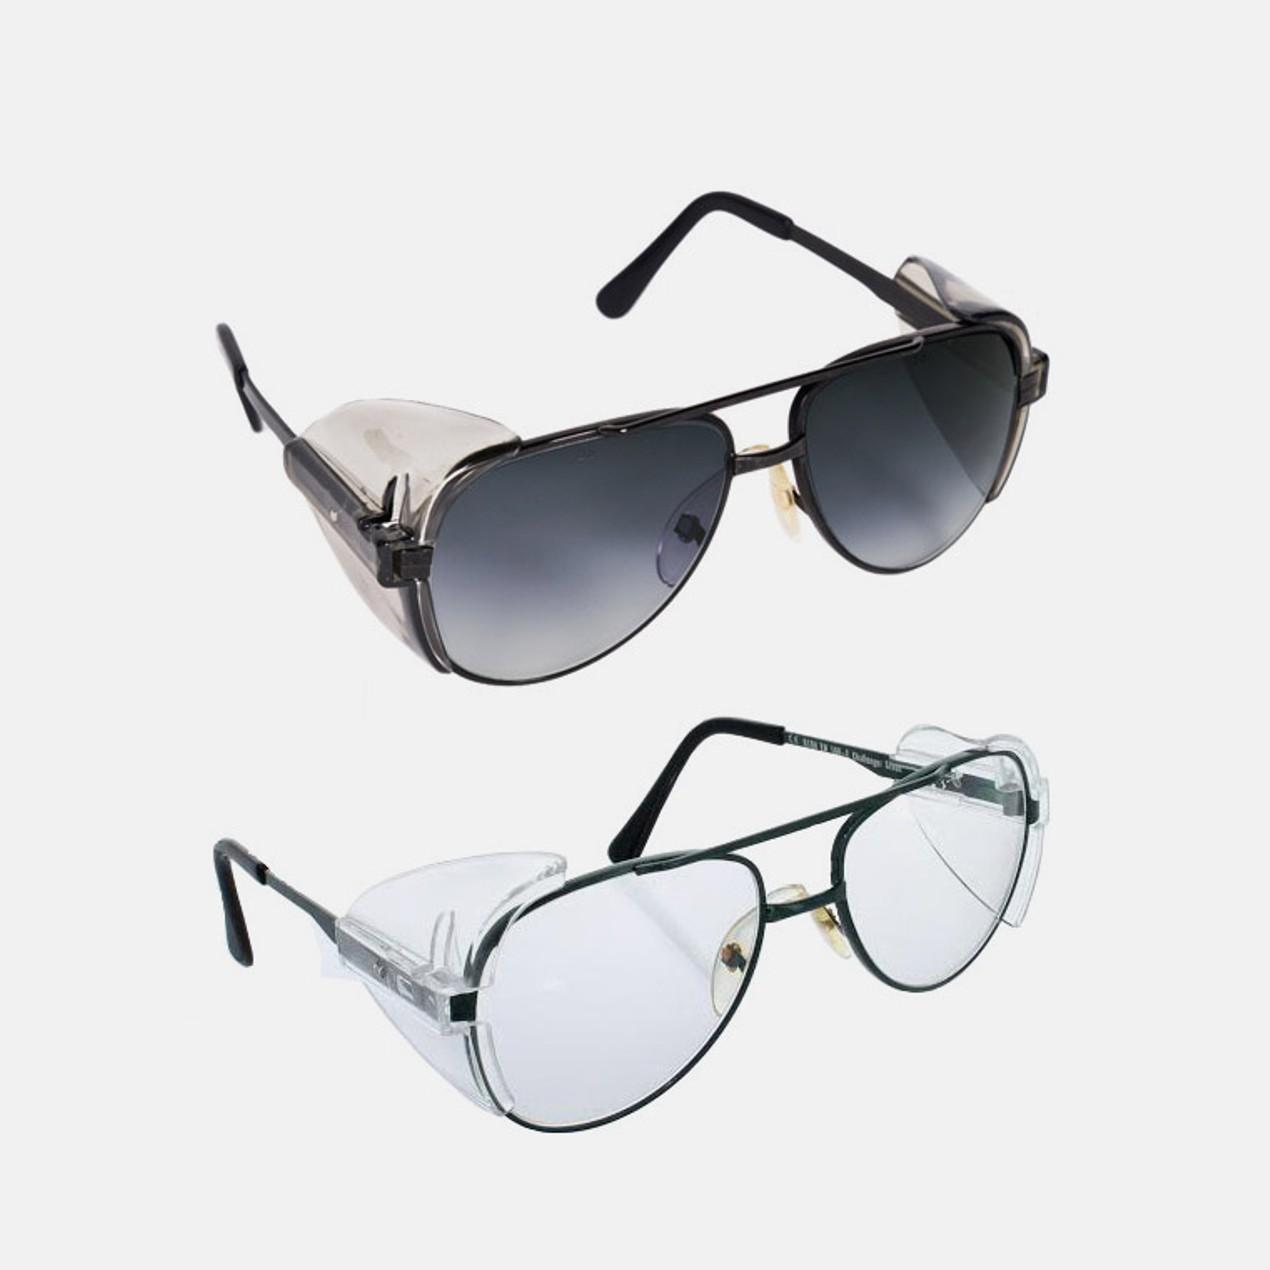 3-Pack Titmus by Honeywell Protective Eyeglasses - Tanga